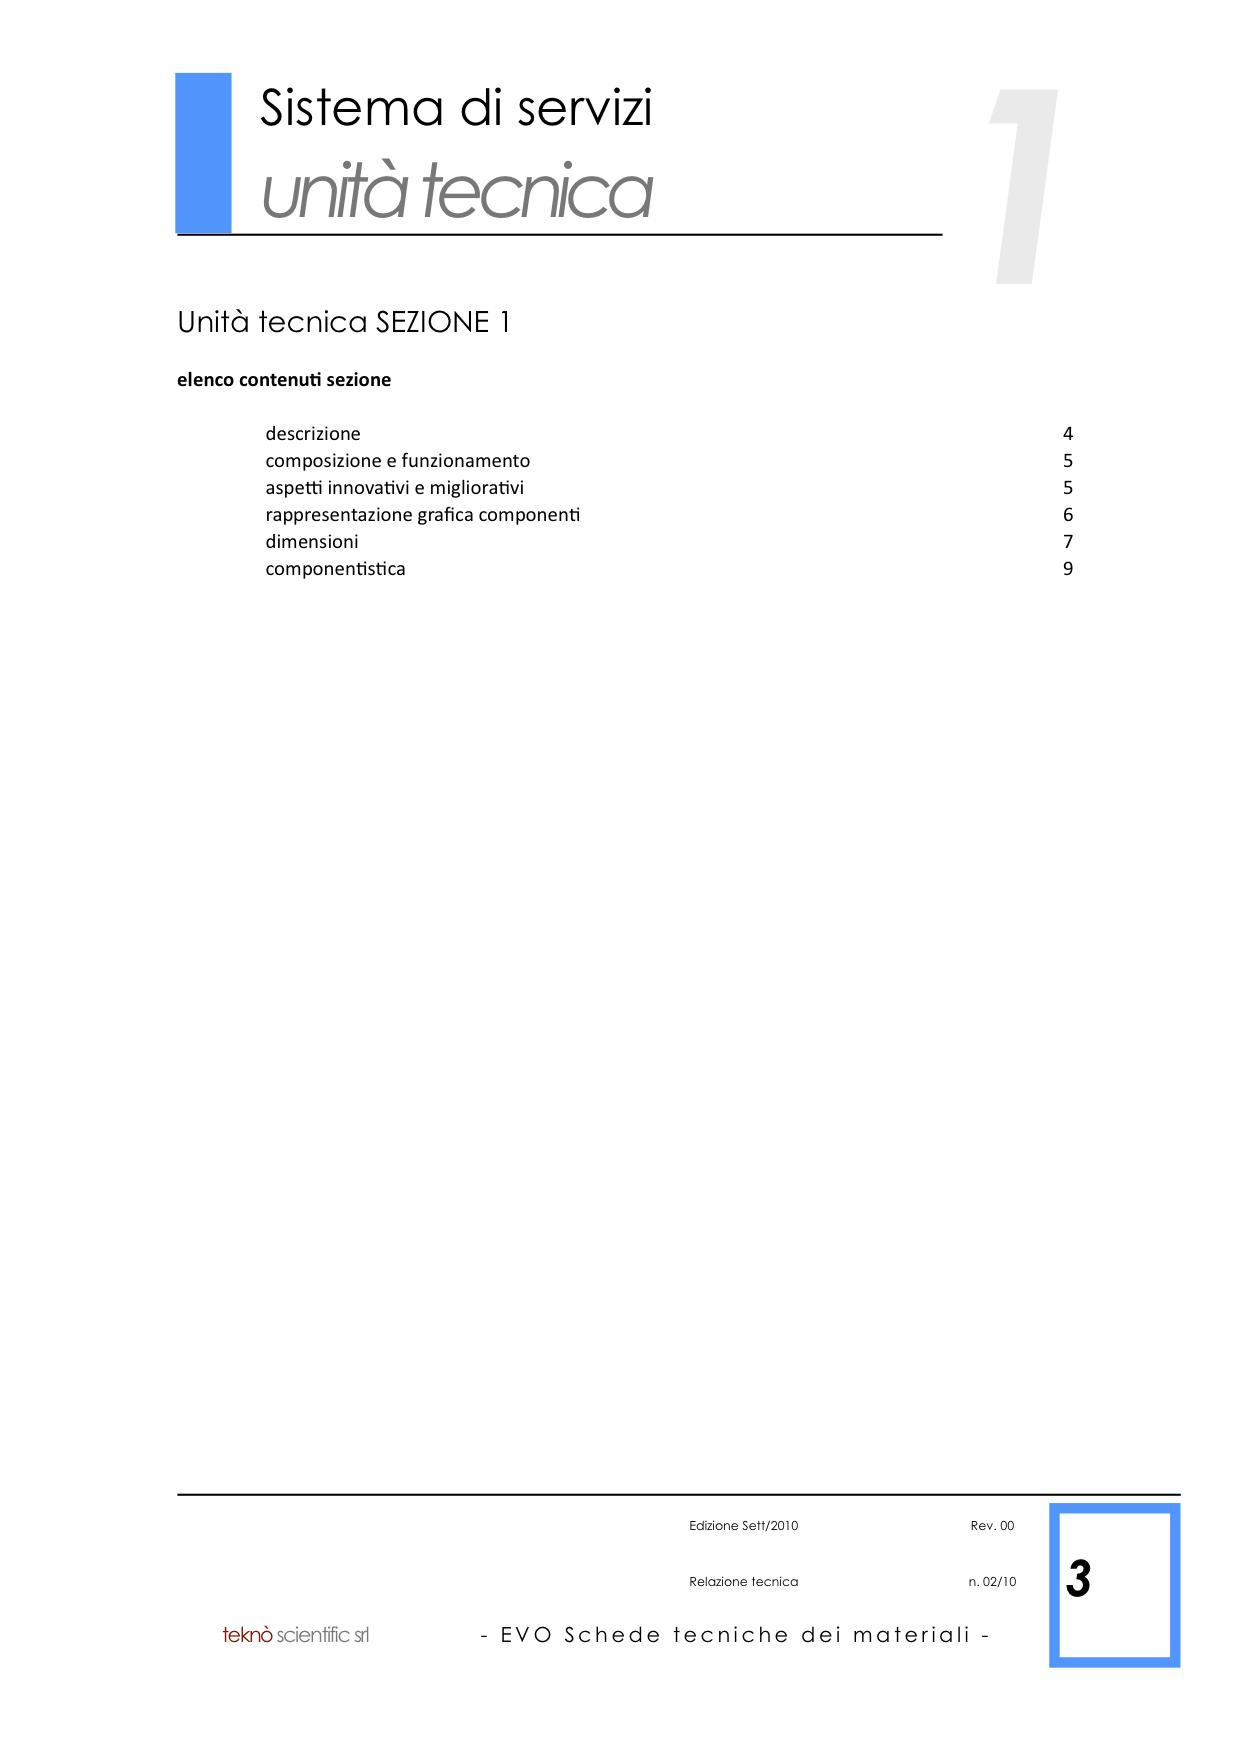 EVO Schede Tecniche materiali copia 3.png